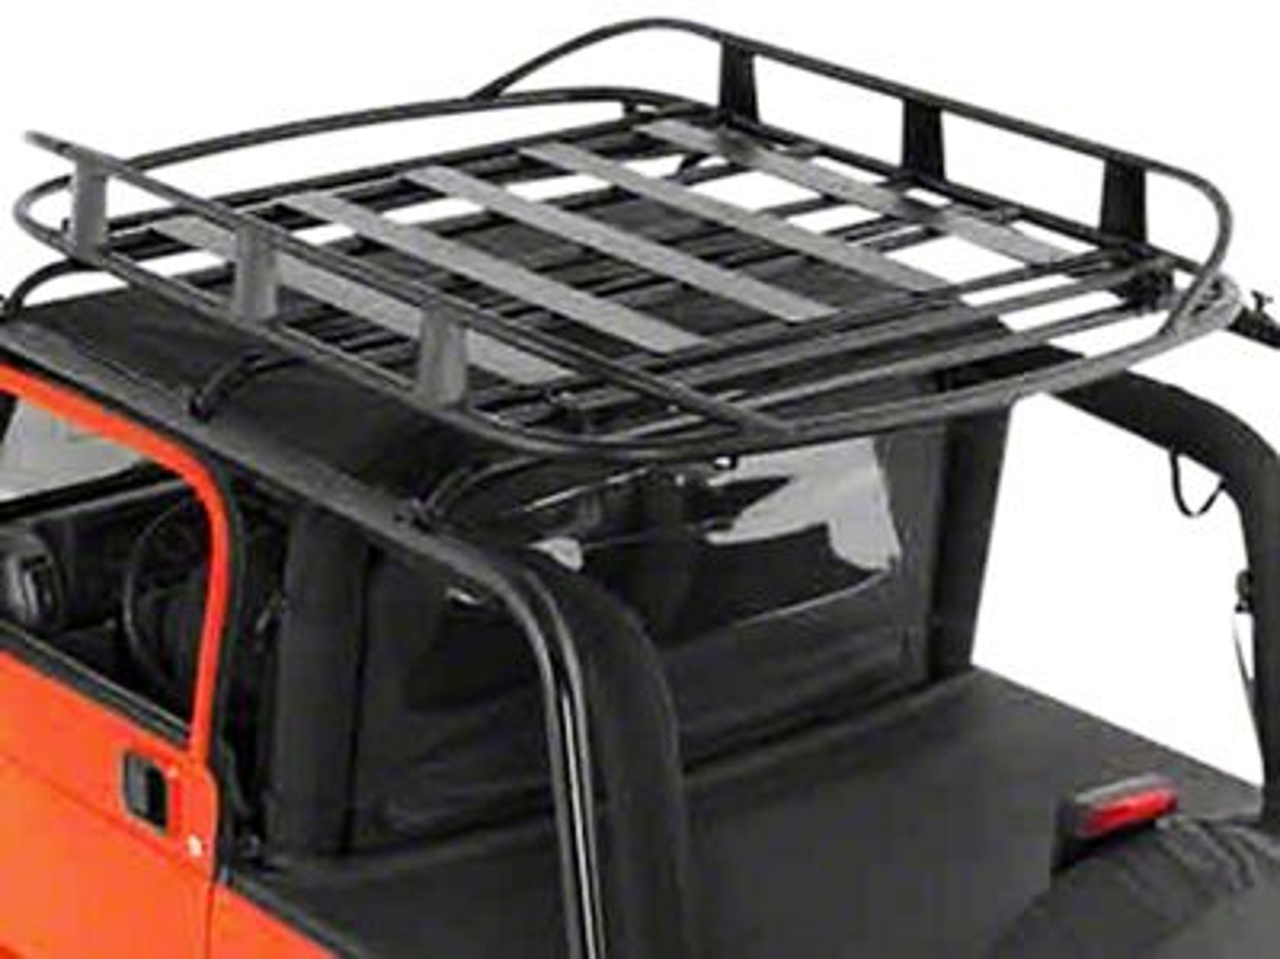 Smittybilt Jeep Wrangler Rugged Rack Roof Basket 250 Lb Rating Black 17185